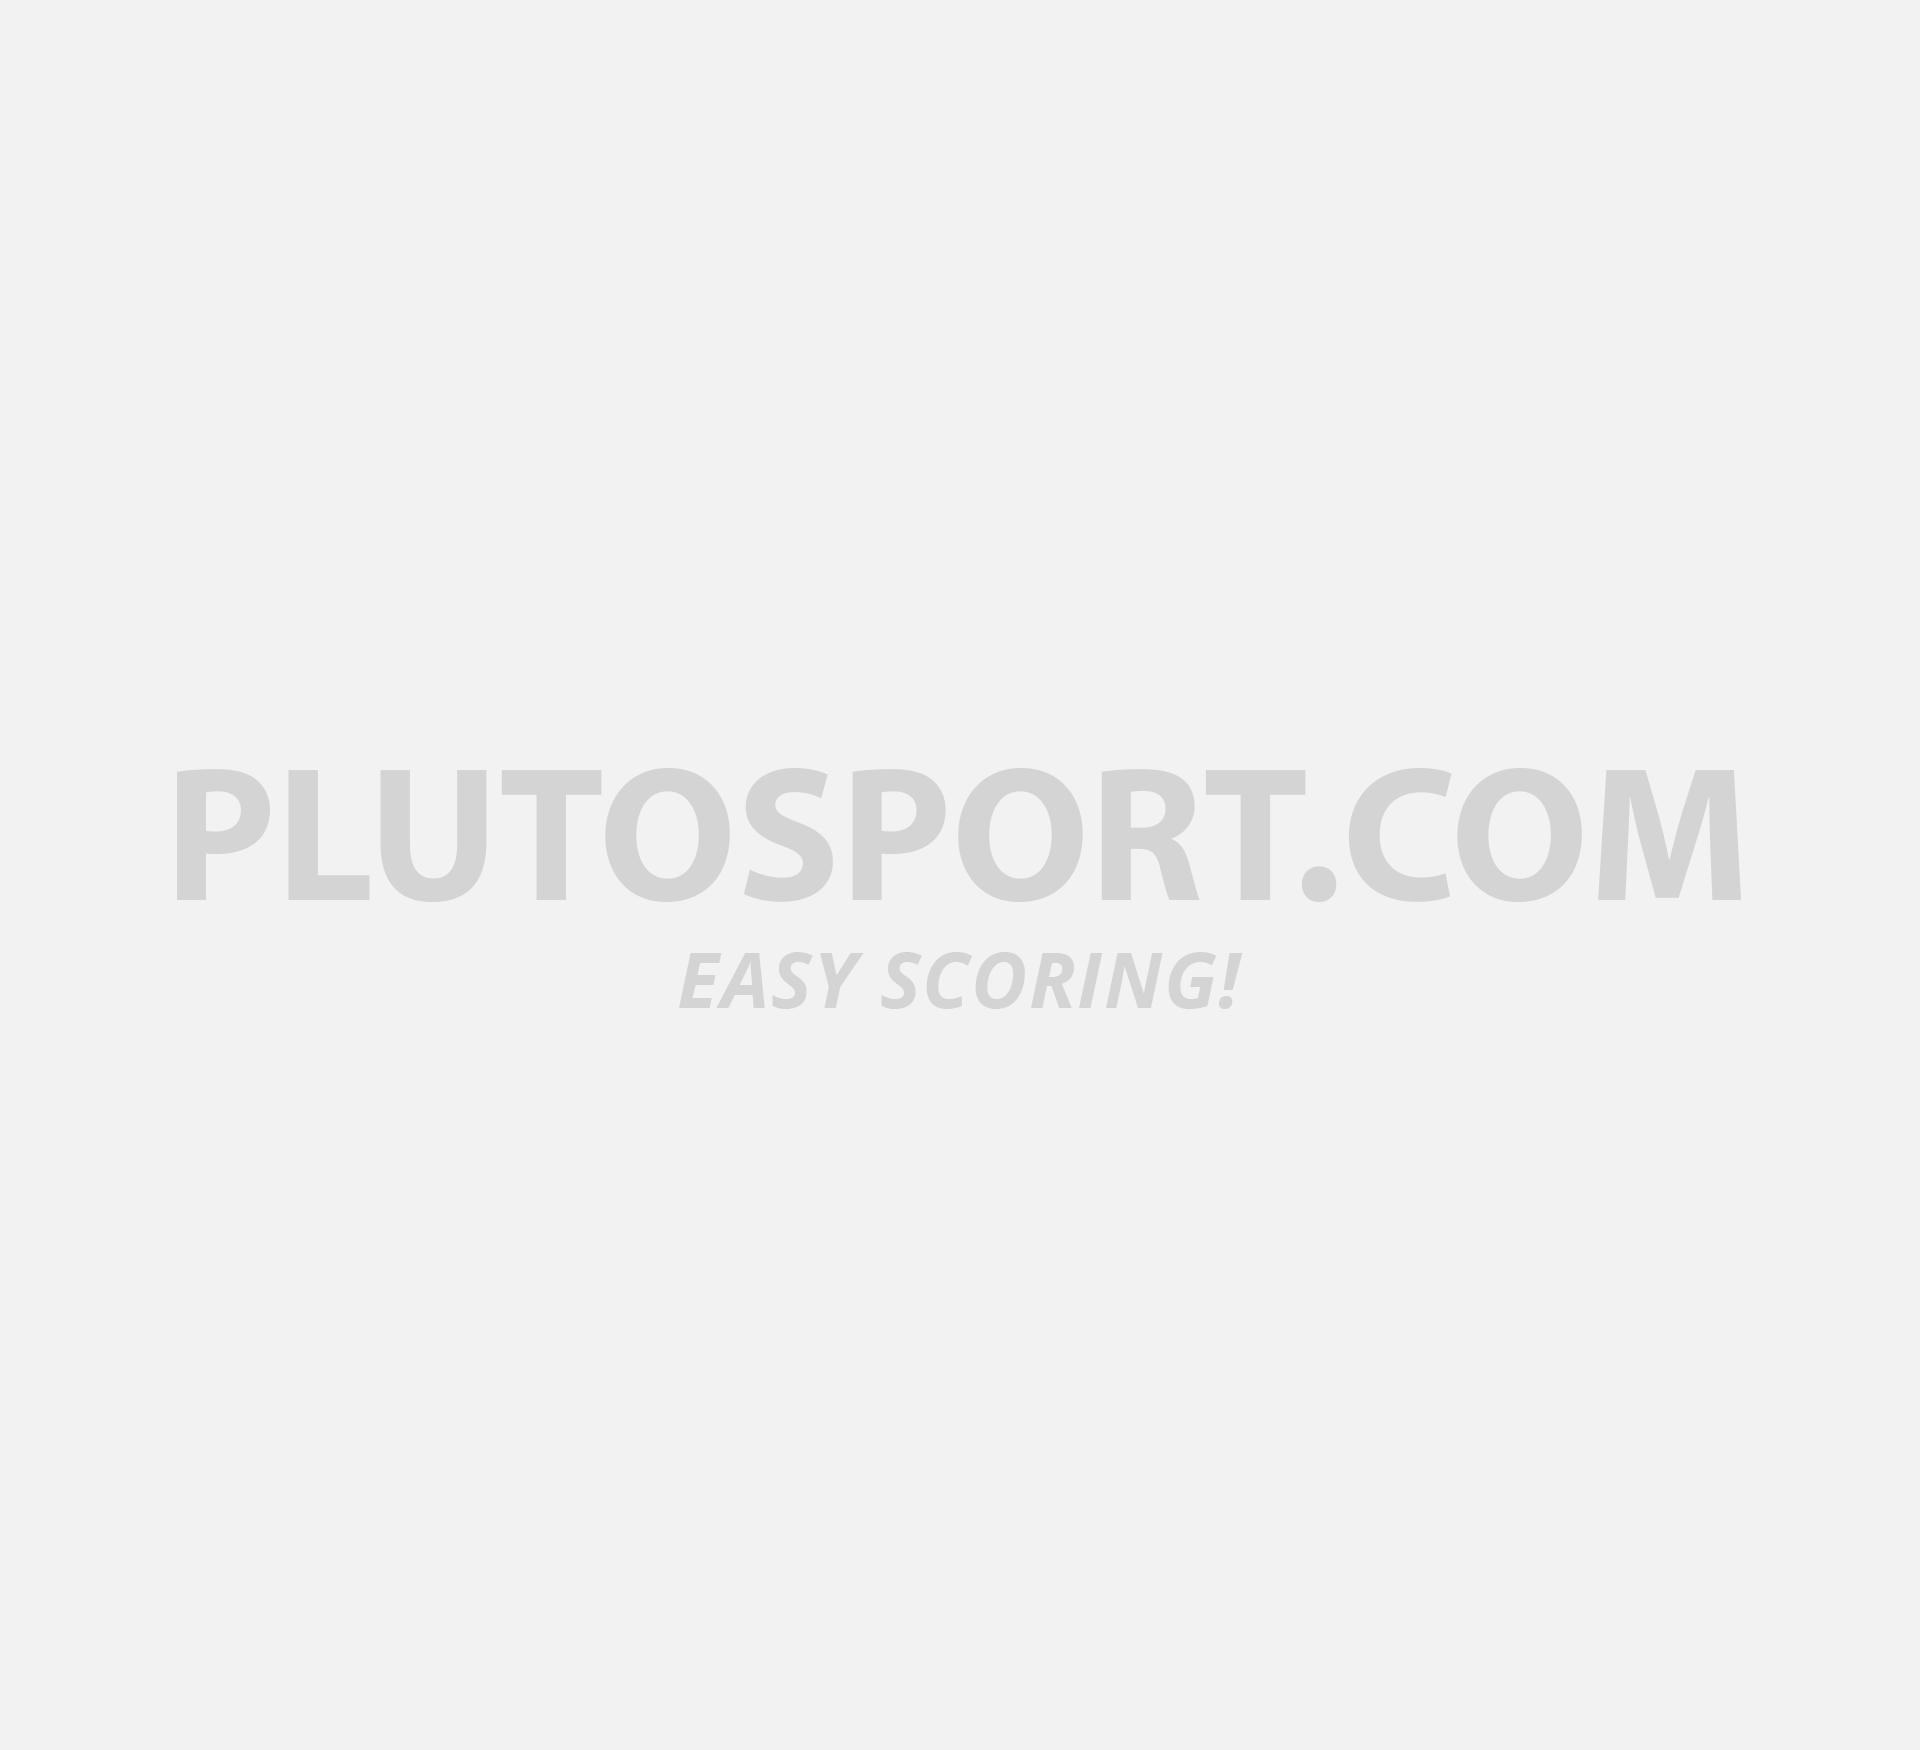 Excelente Mediana vestir  Nike Tiempo Legend 8 Academy MG Footballshoe Men - Boots fixed stud - Shoes  - Football - Sports | Plutosport